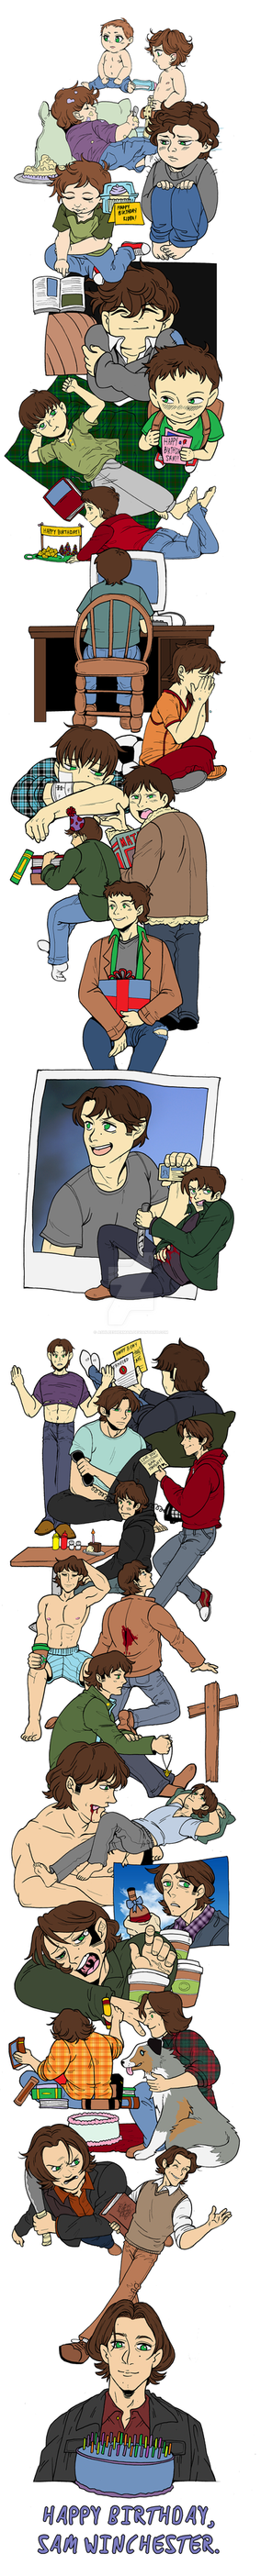 Sam's Years by AshleeSherman